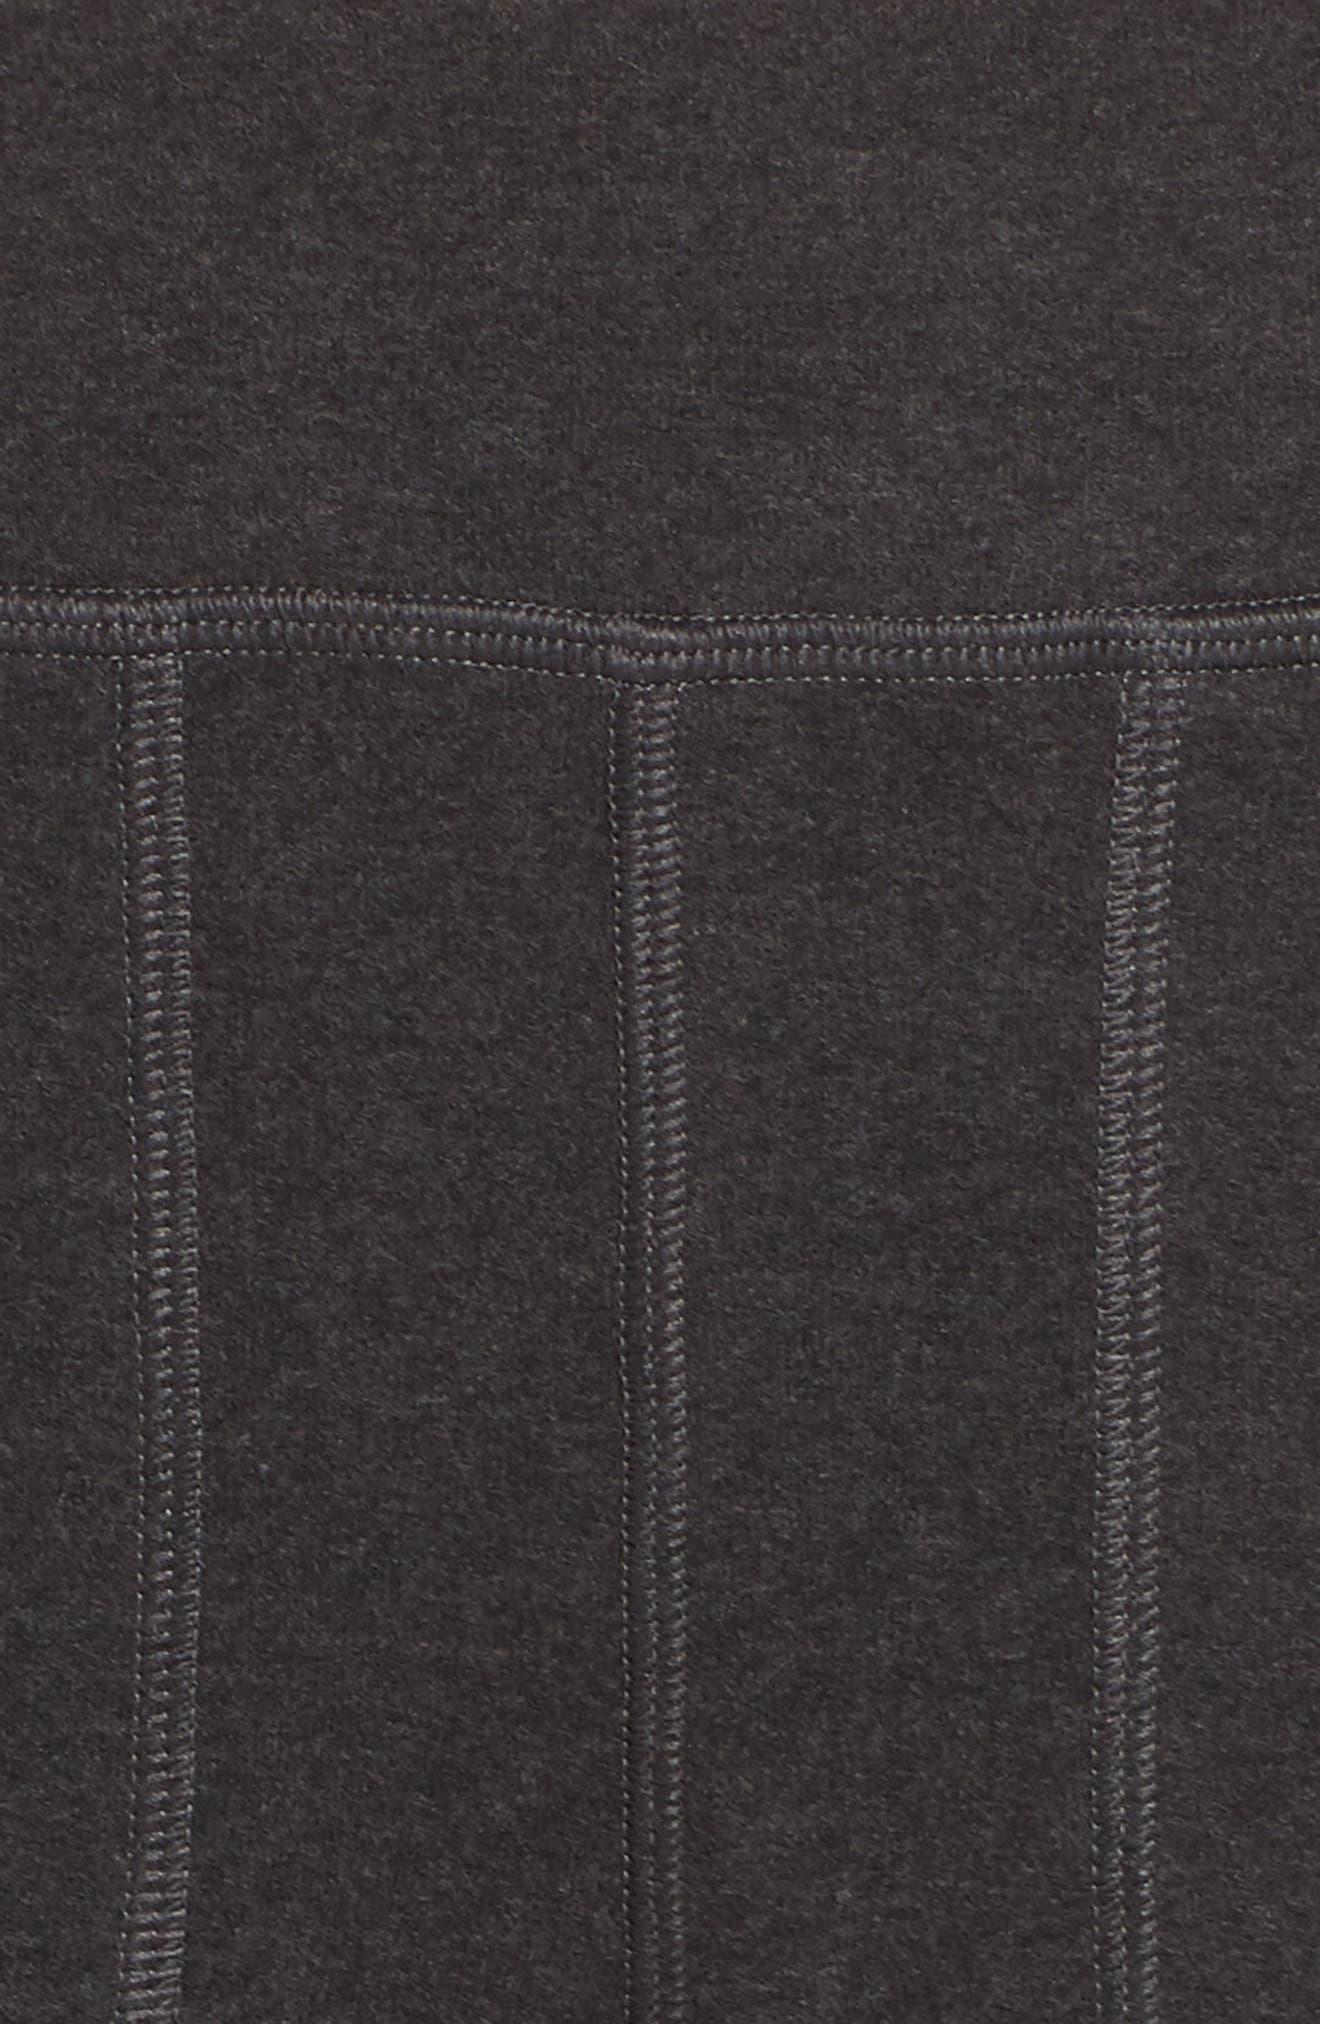 Luxe Liberty Jogger Pants,                             Alternate thumbnail 6, color,                             BLACK MARL